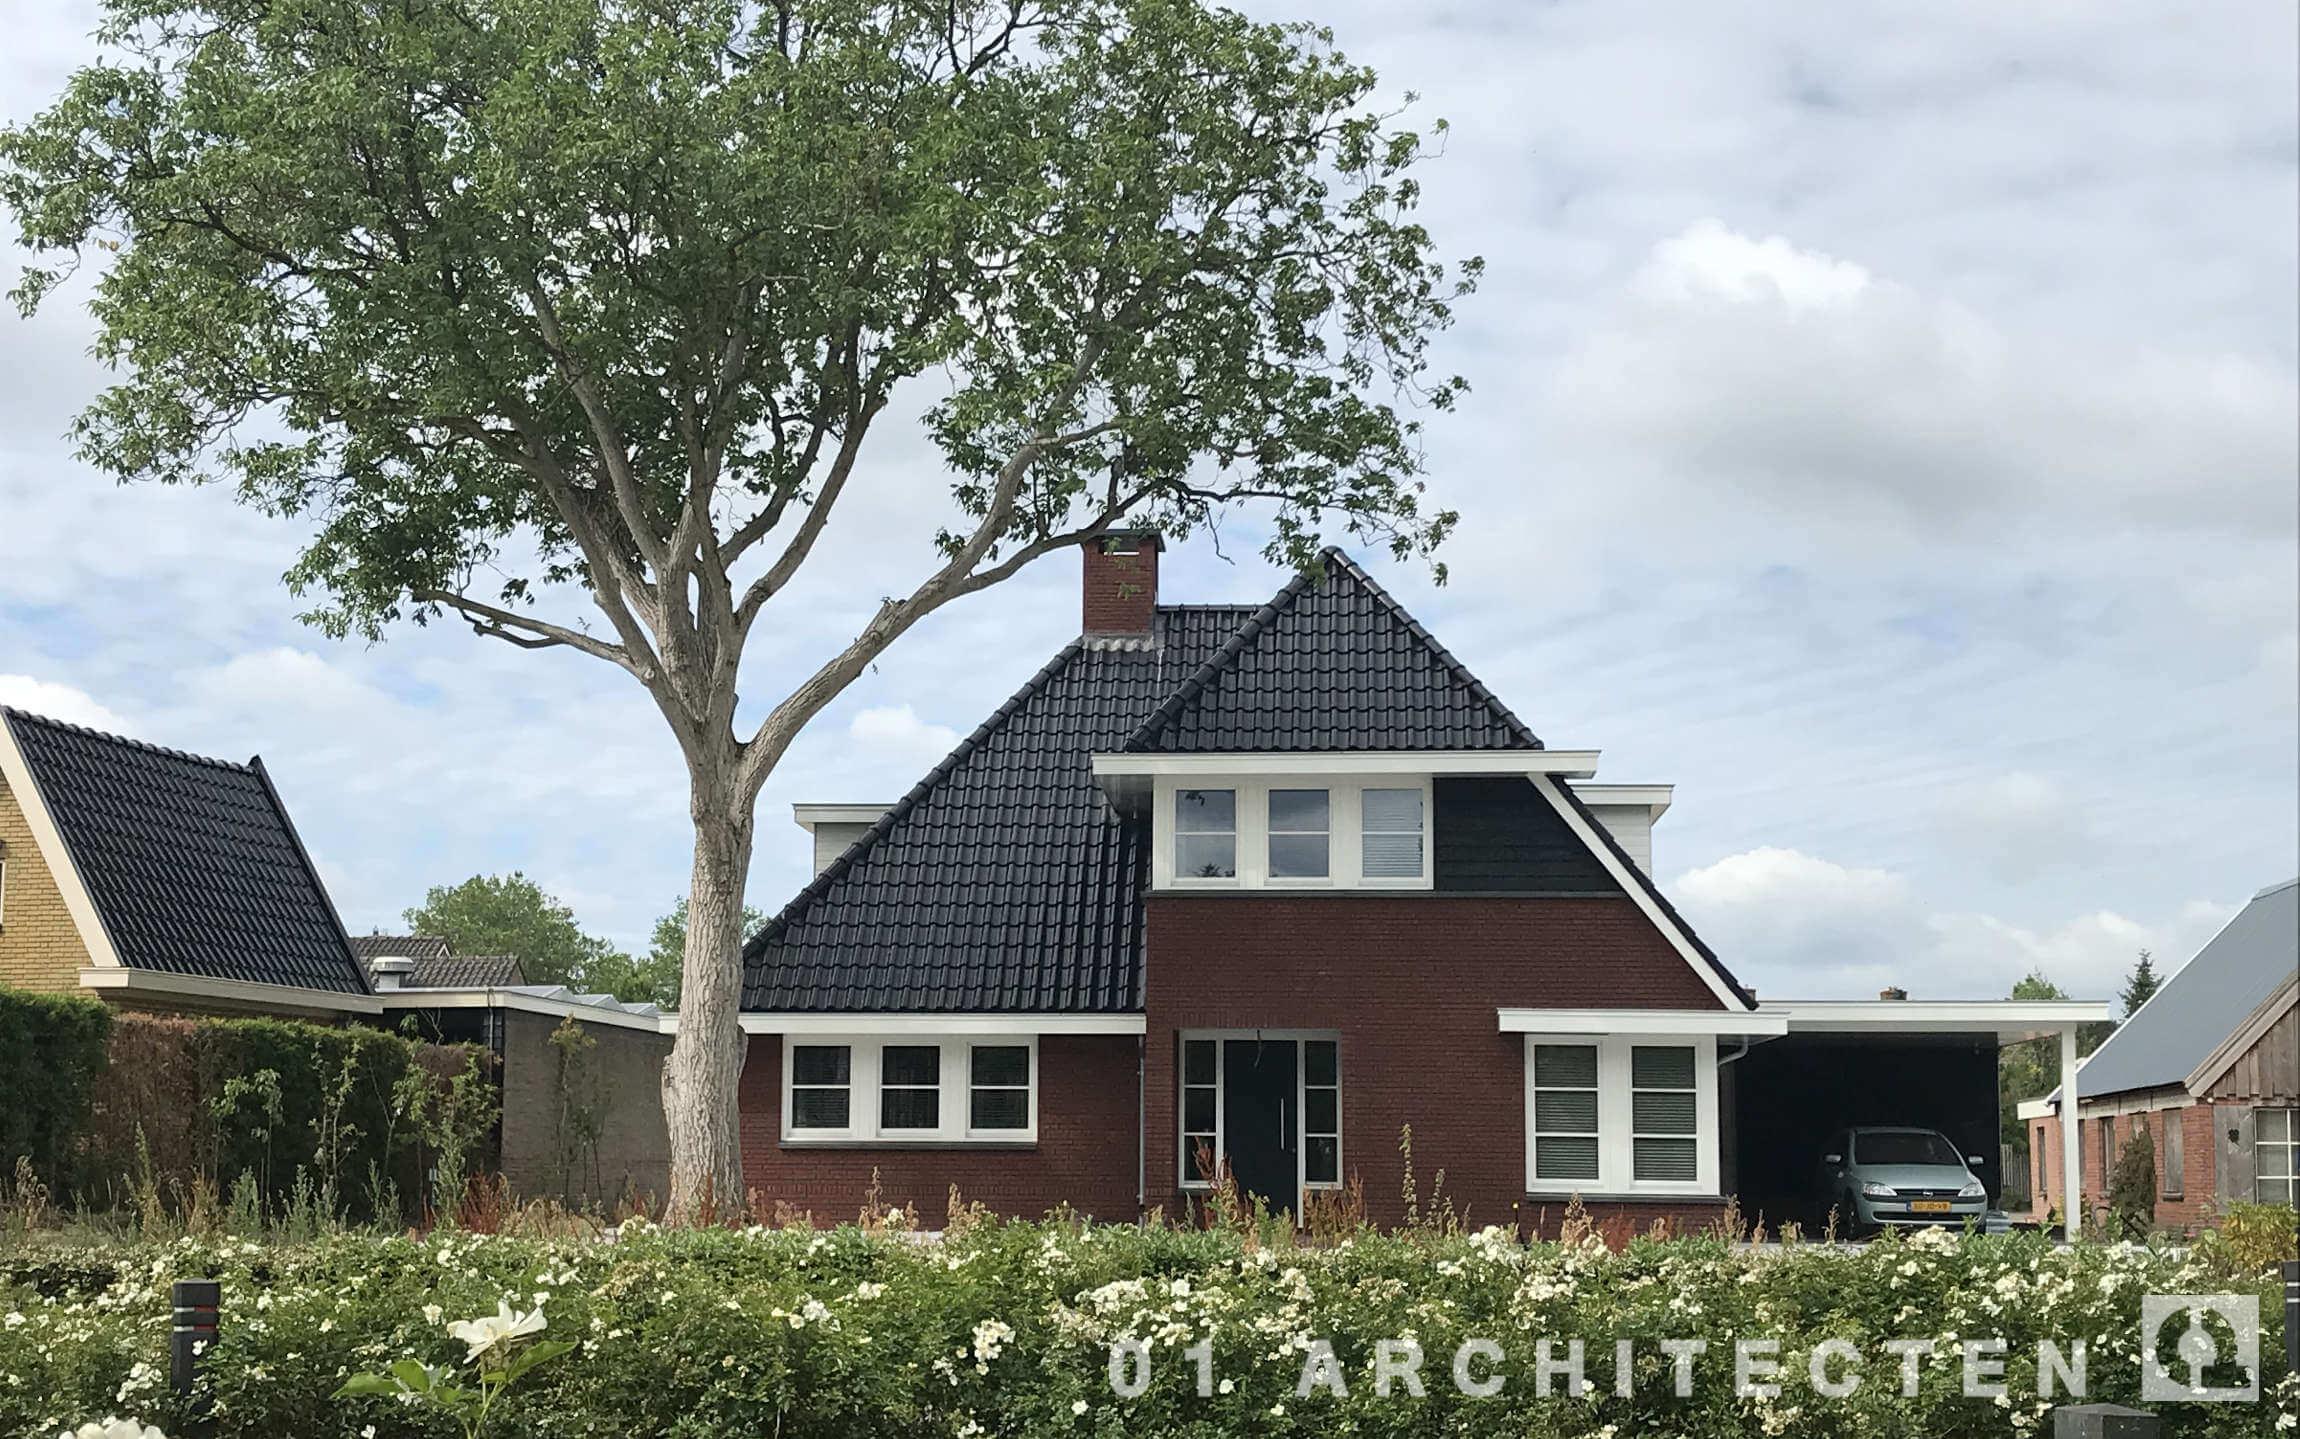 Nieuwbouw_jaren 30 dakpannen